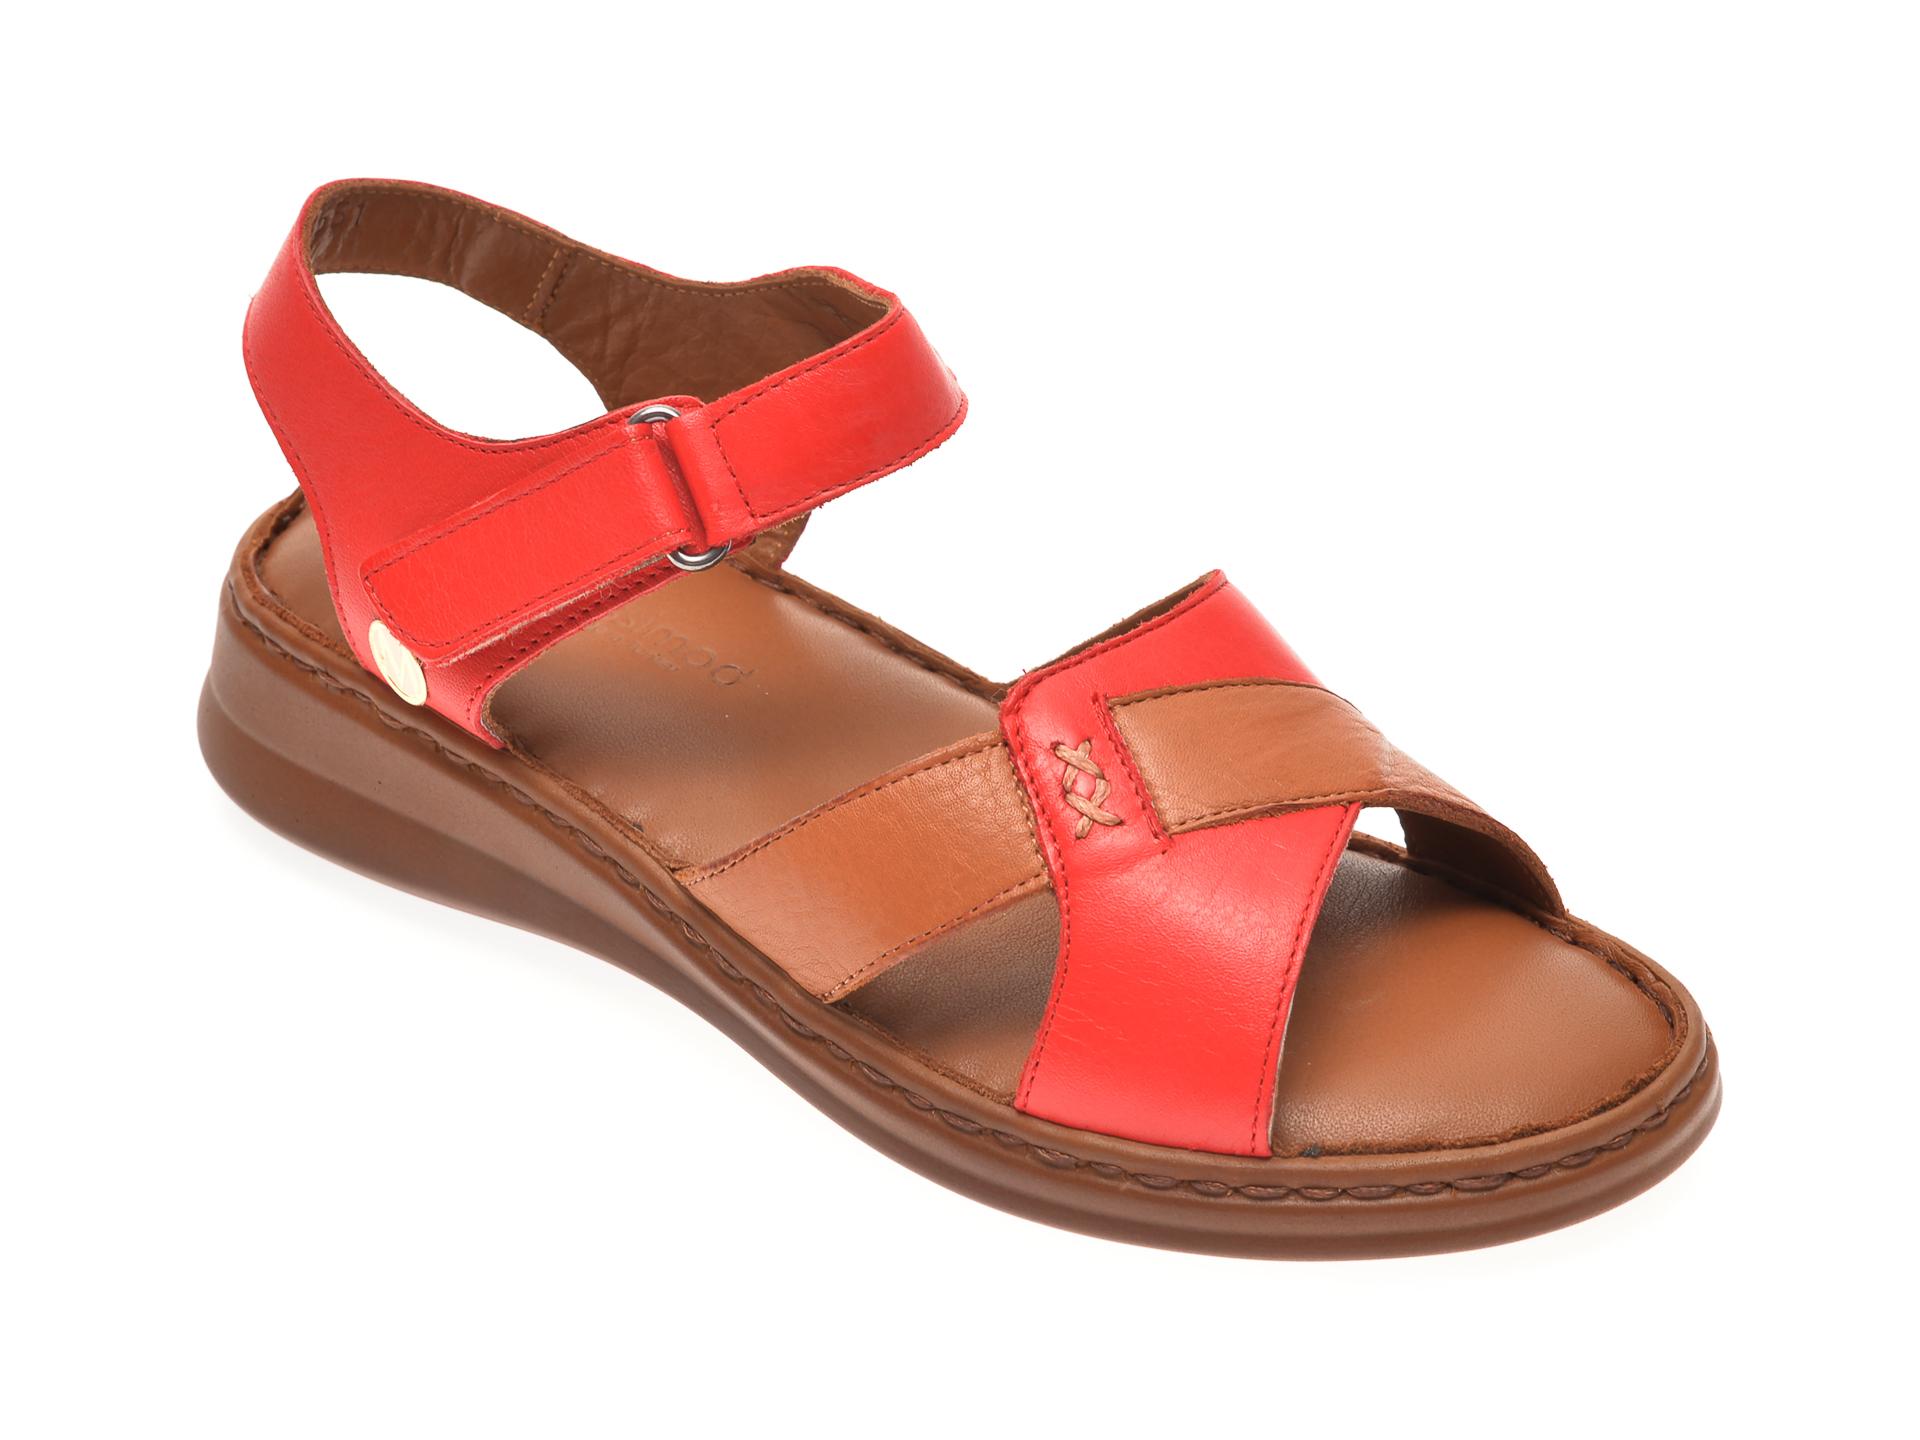 Sandale MESSIMODA rosii, 20Y3561, din piele naturala